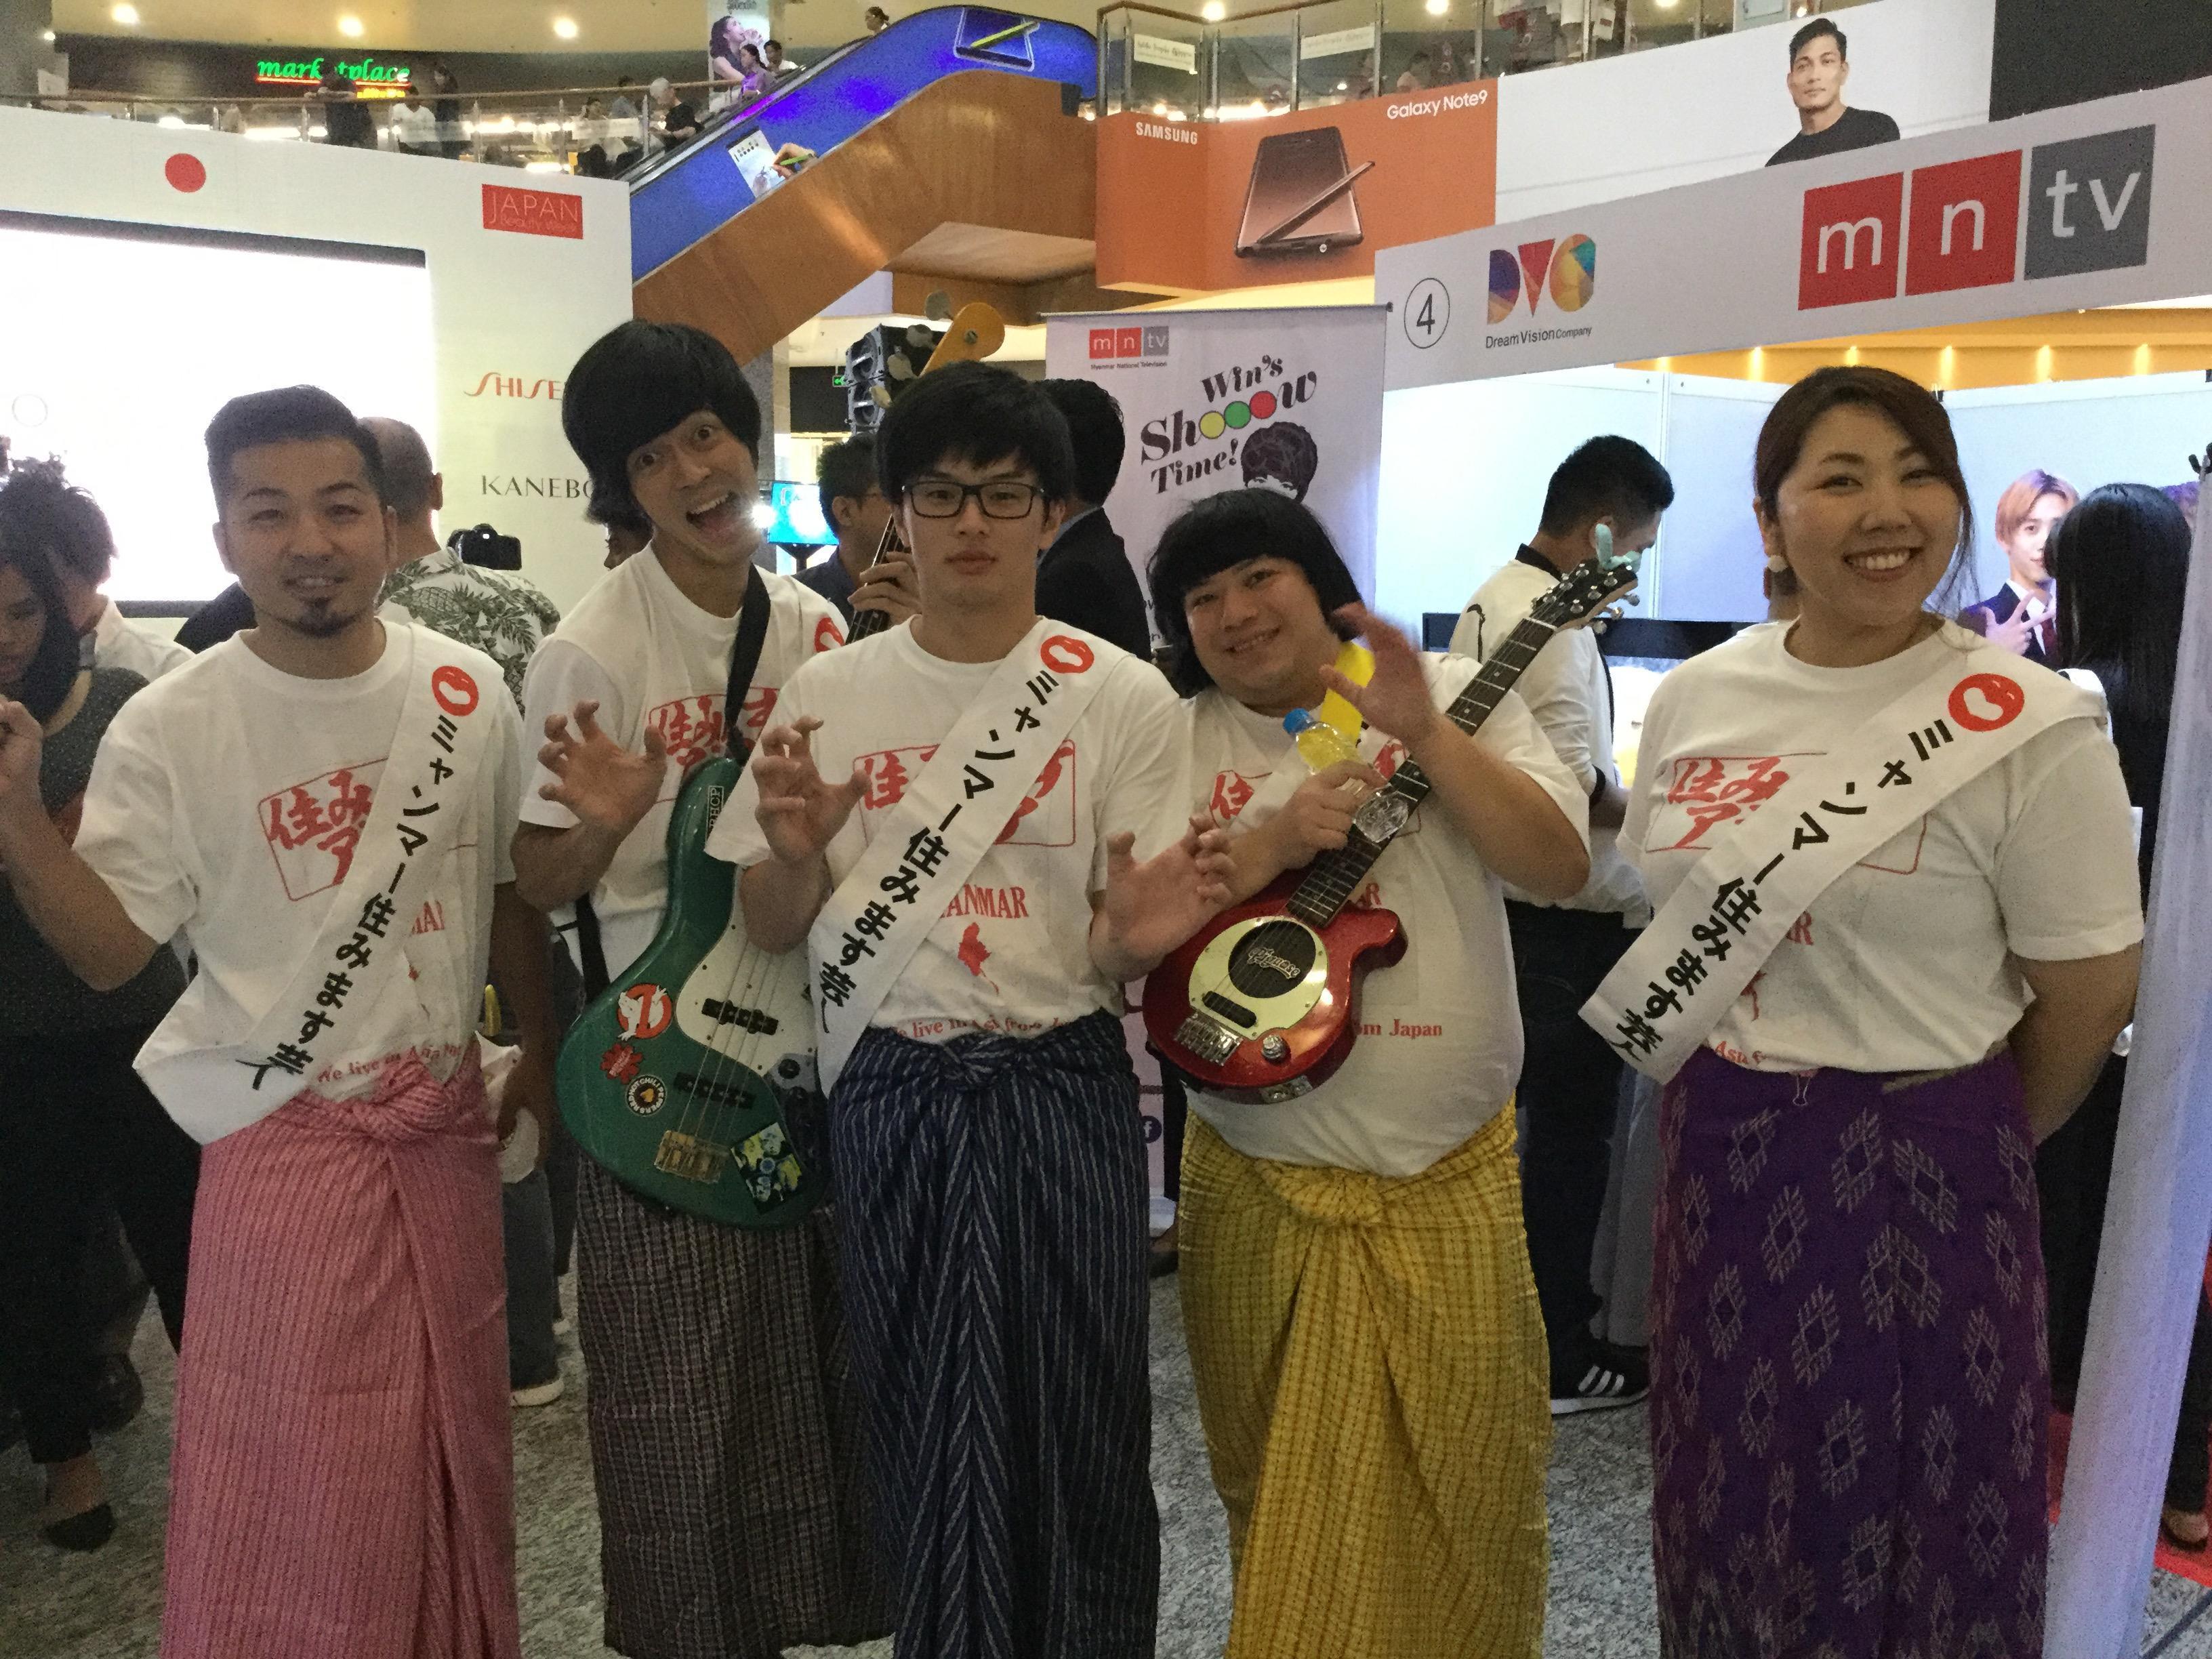 http://news.yoshimoto.co.jp/20181031173345-27e98a87d4b1b44492871943aa02c7468f255fc6.jpg